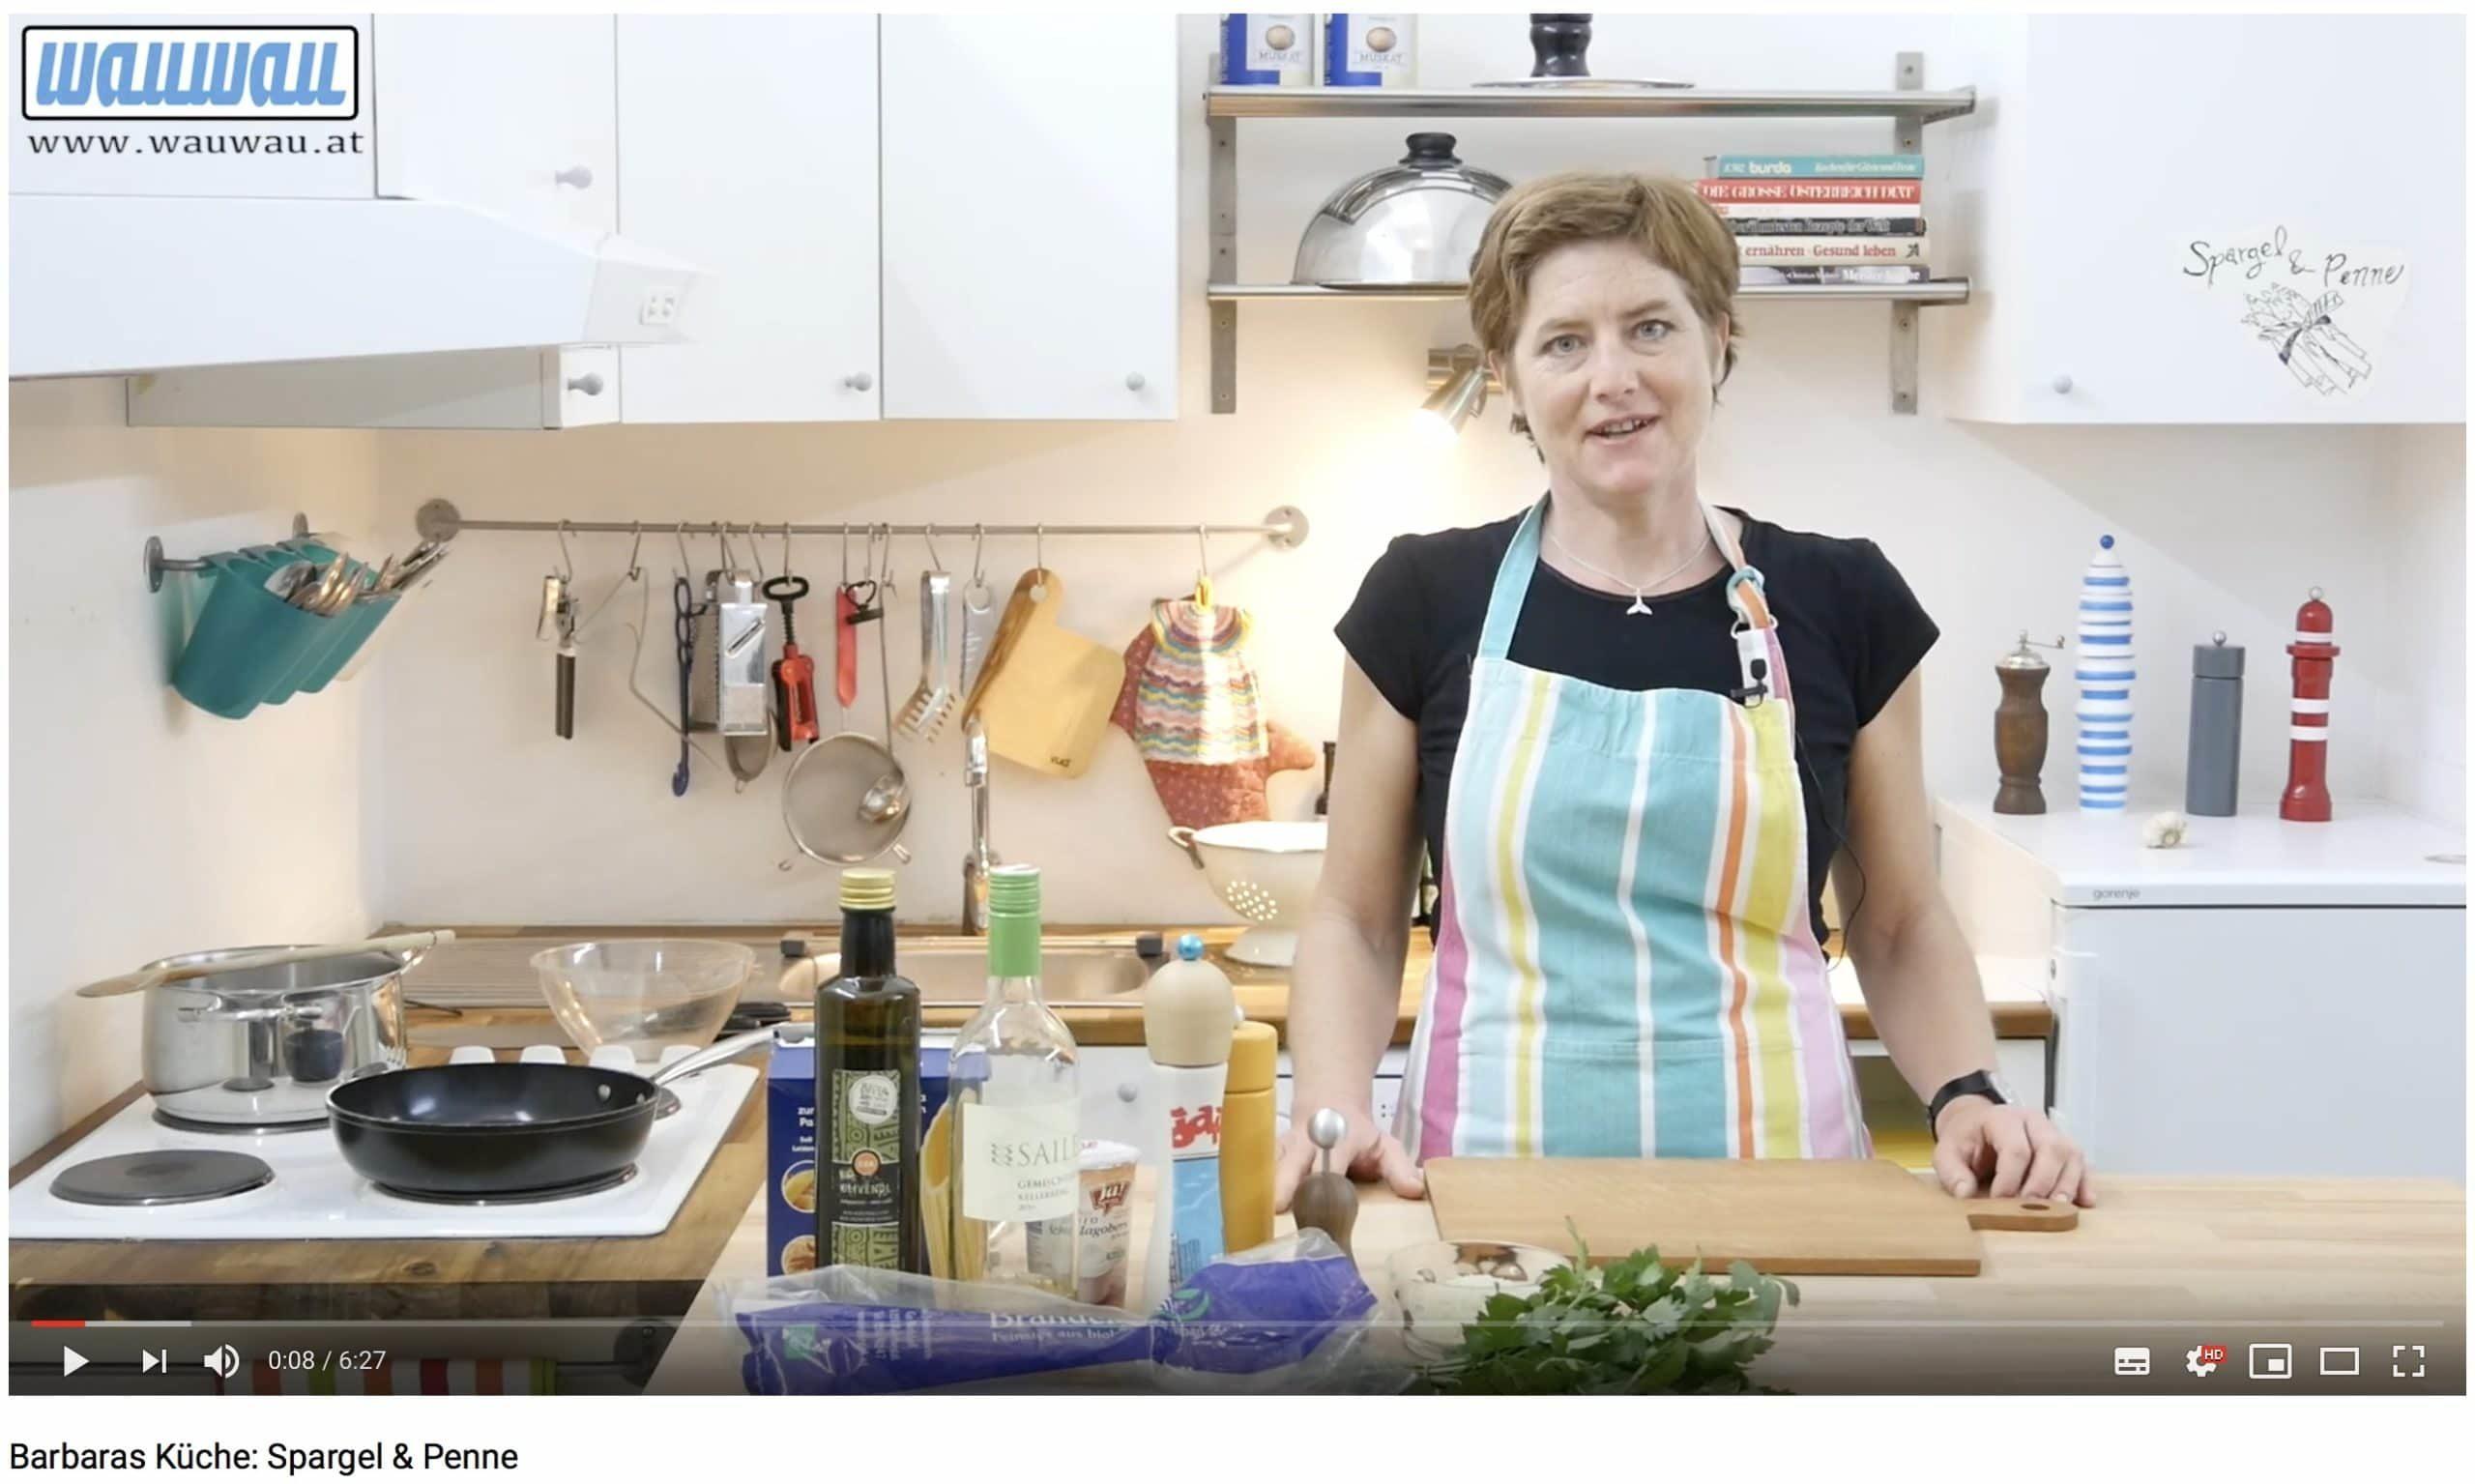 Barbaras Küche: Marille & Chili - Marillenröster - WauWau